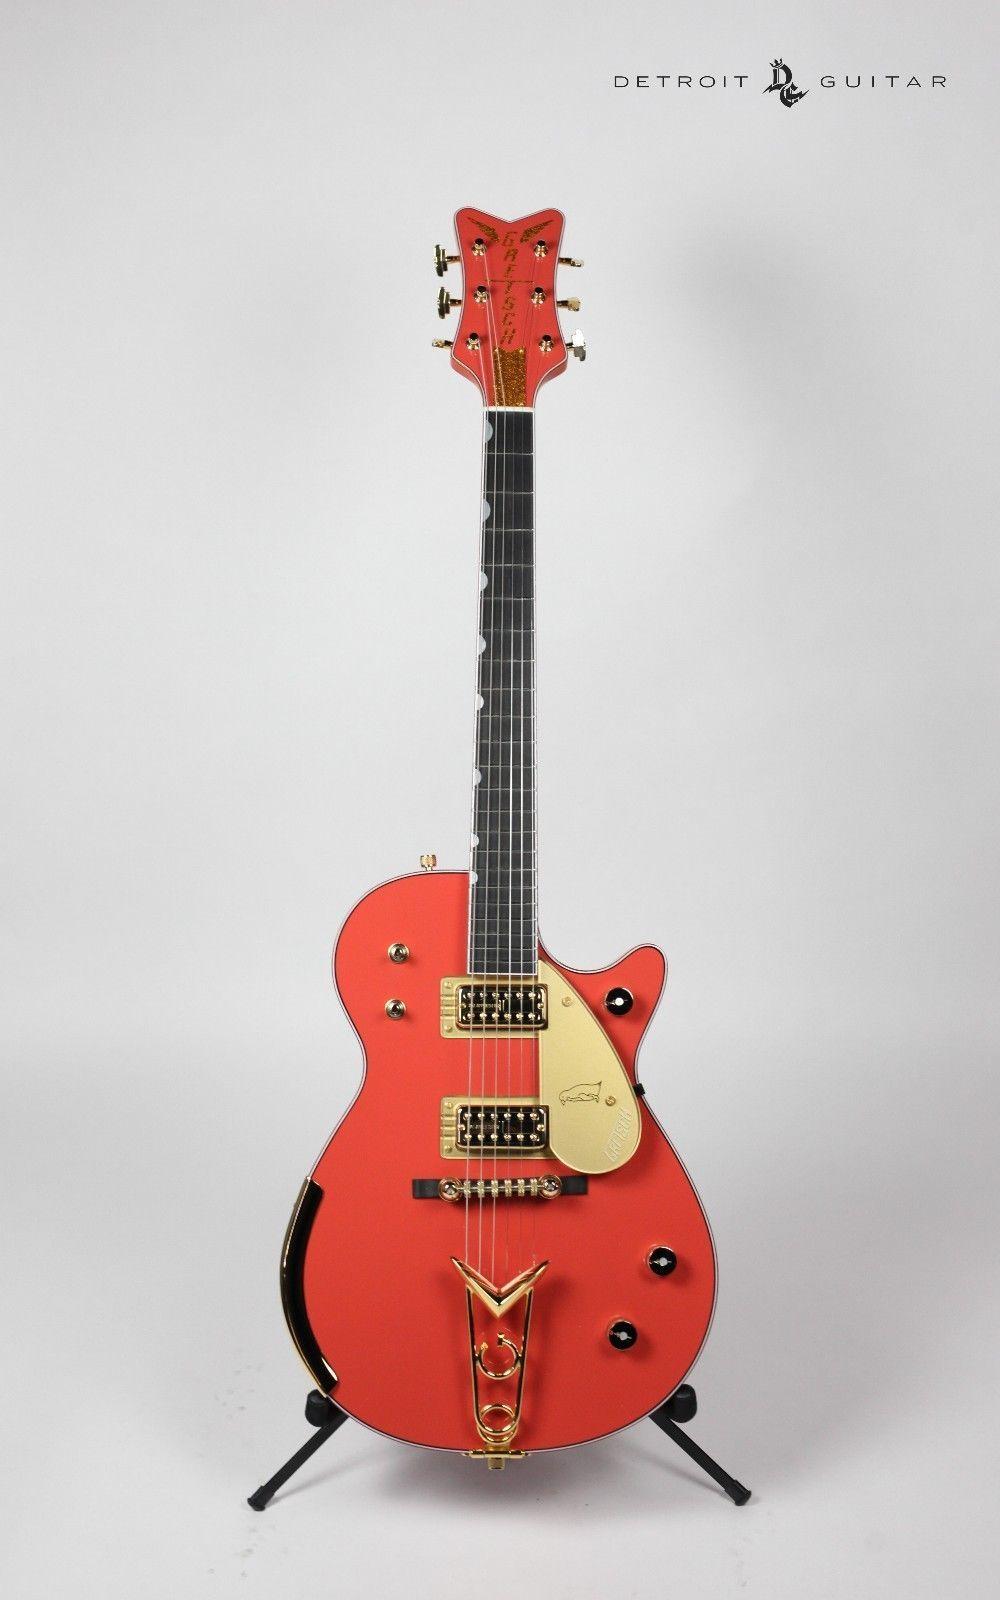 Gretsch Custom Shop Masterbuilt G6134cs 1958 Penguin Tahitian Coral Lollar Pickup Wiring Diagram Fender Telecaster Musical Instruments